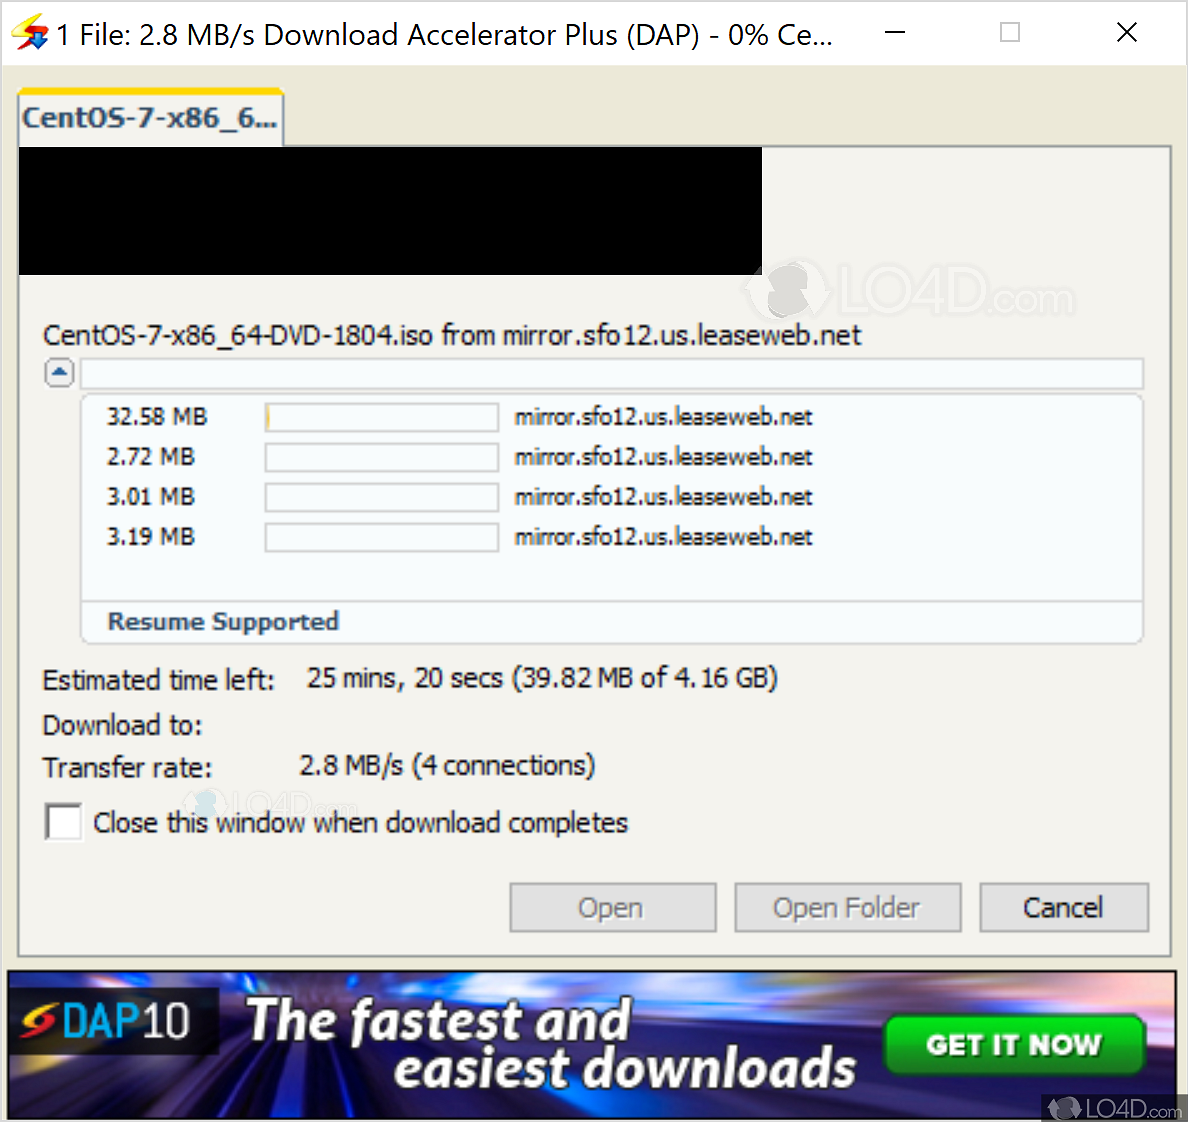 Download Accelerator Plus Chrome - LO4D com